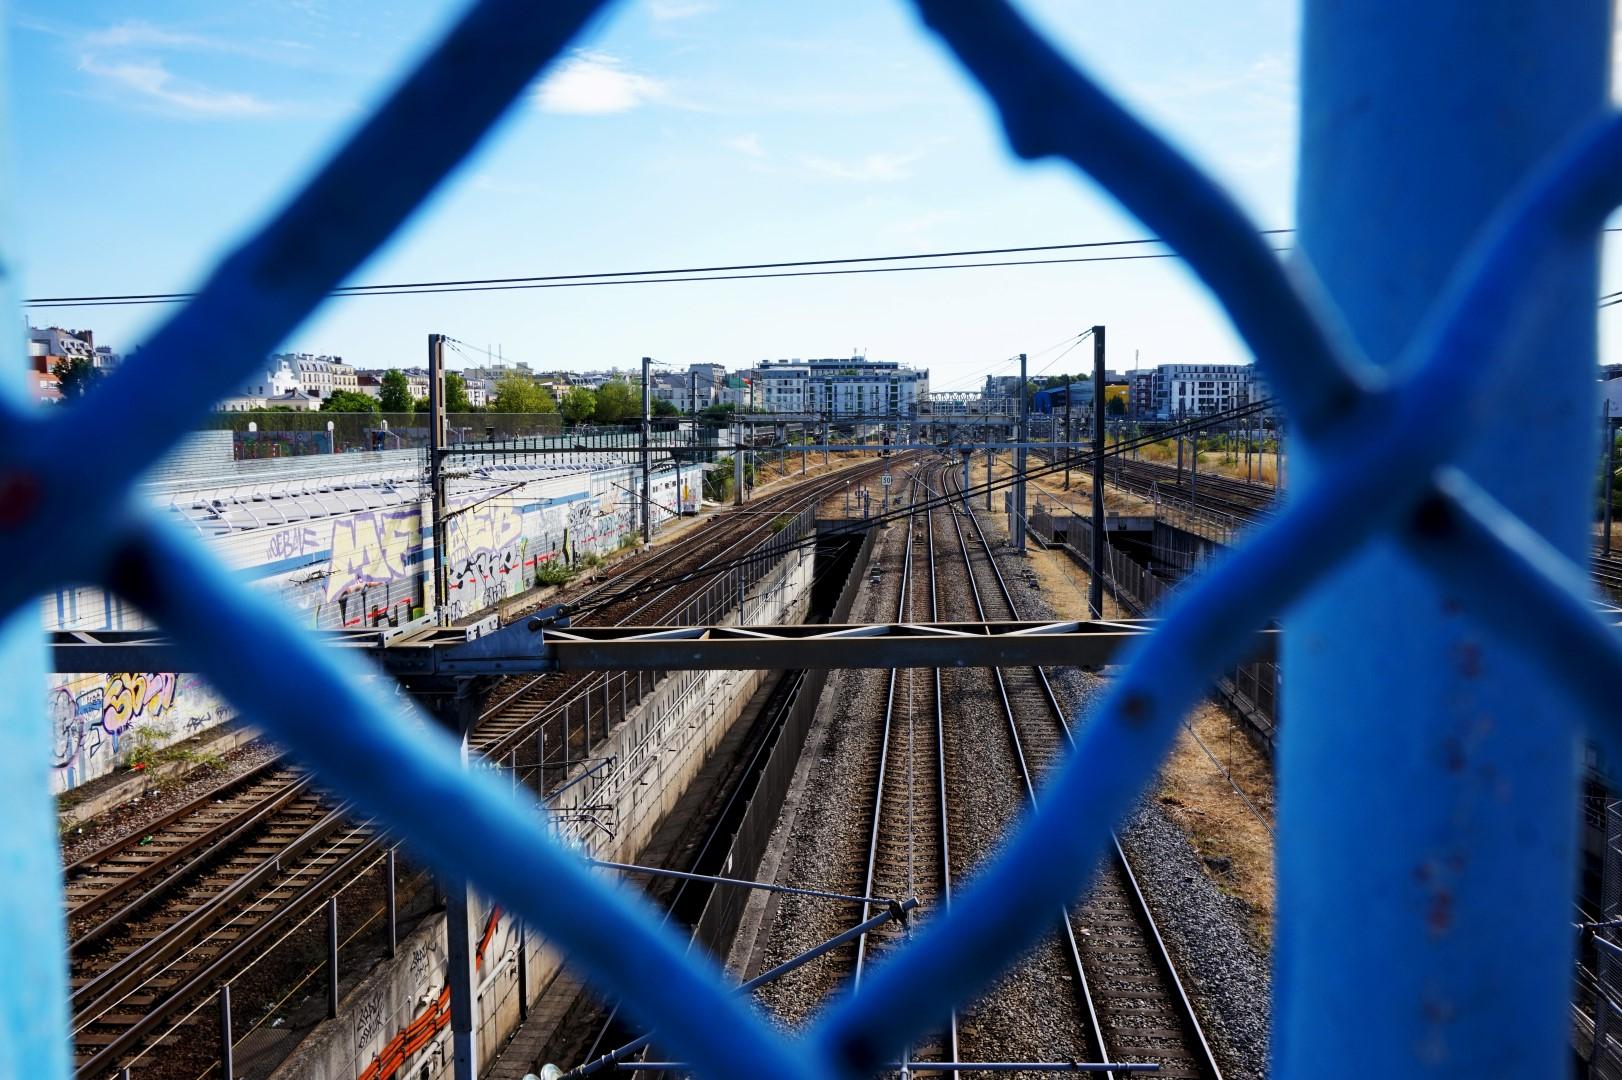 Balade 18e - Voies Gare de l'Est